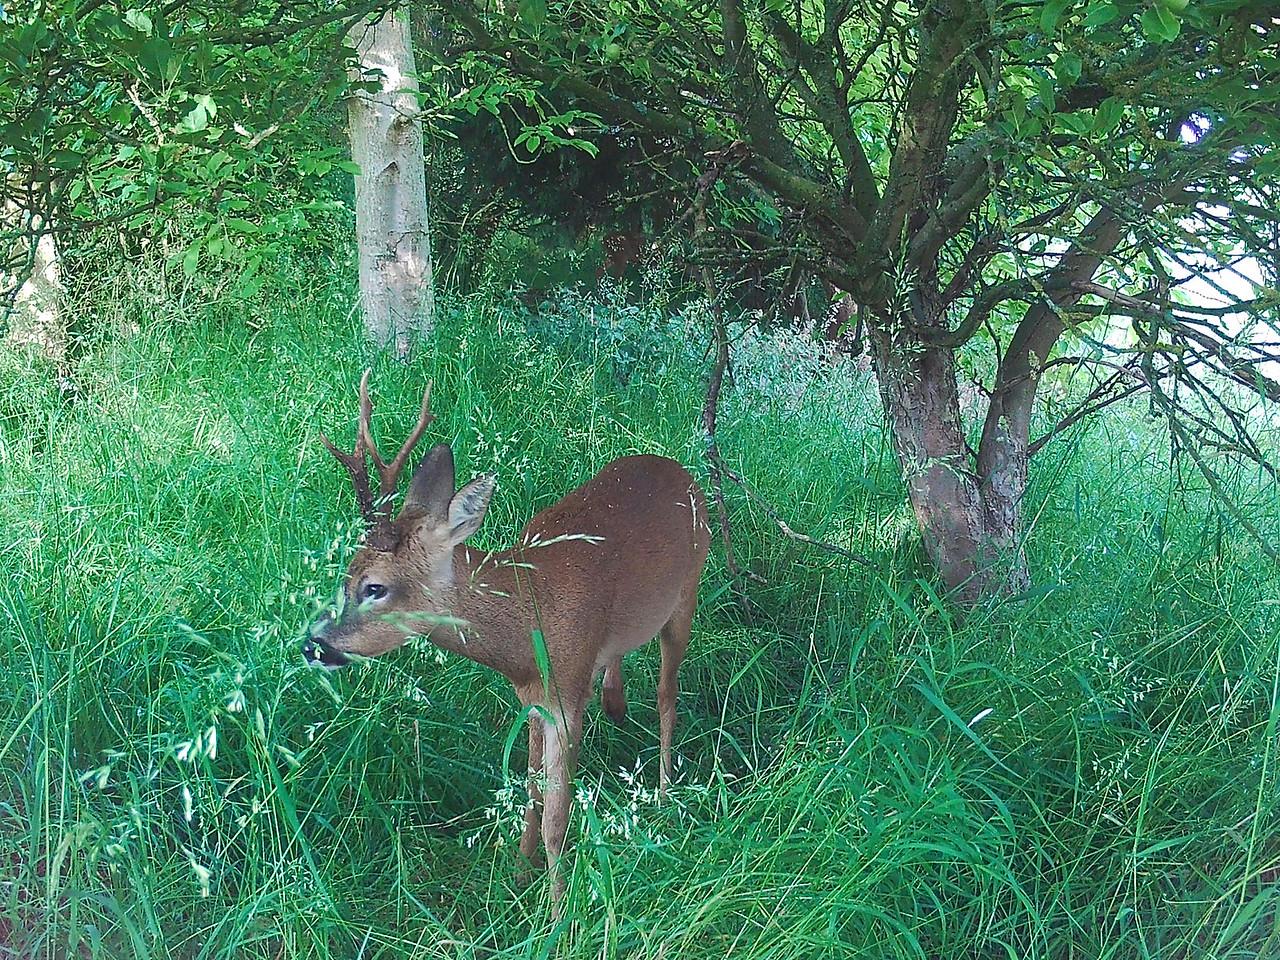 Heath Farm 2015-07-02 at 06-42-32